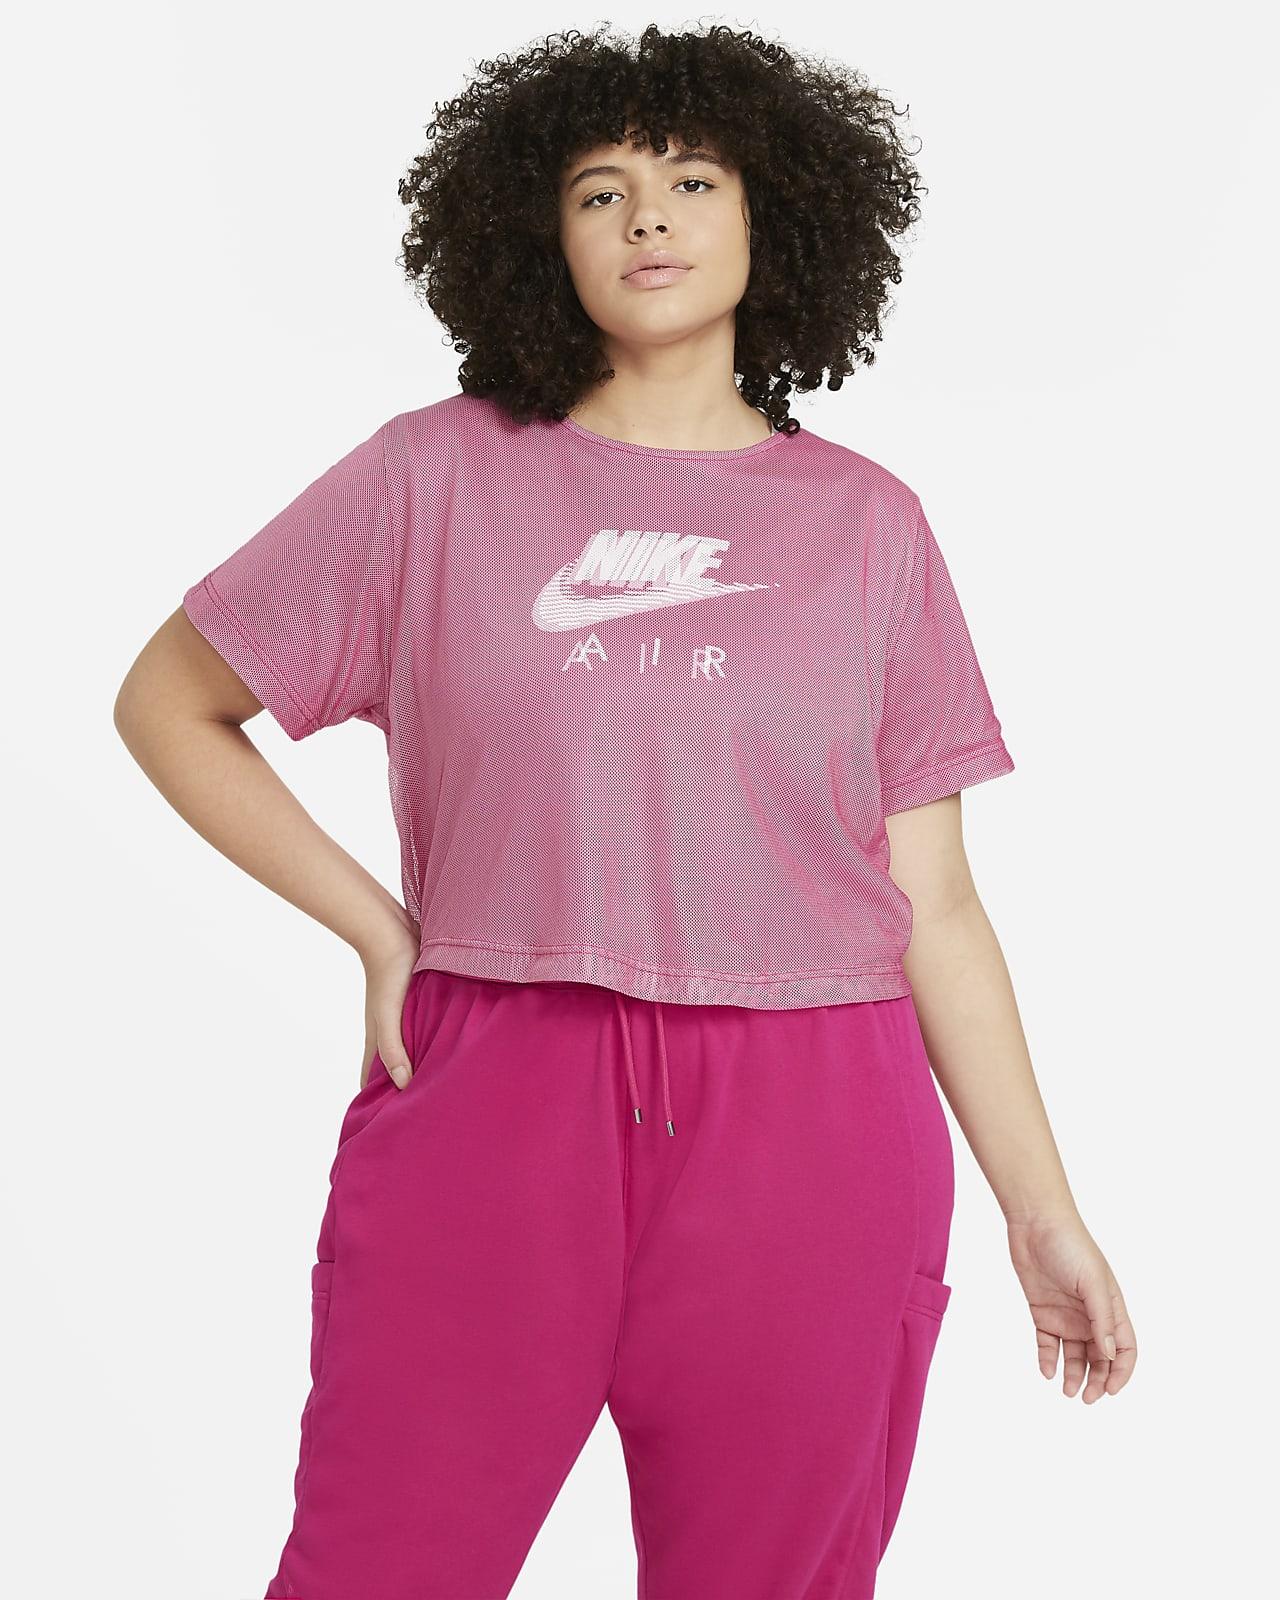 Nike Air Women's Mesh Short-Sleeve Top (Plus Size)